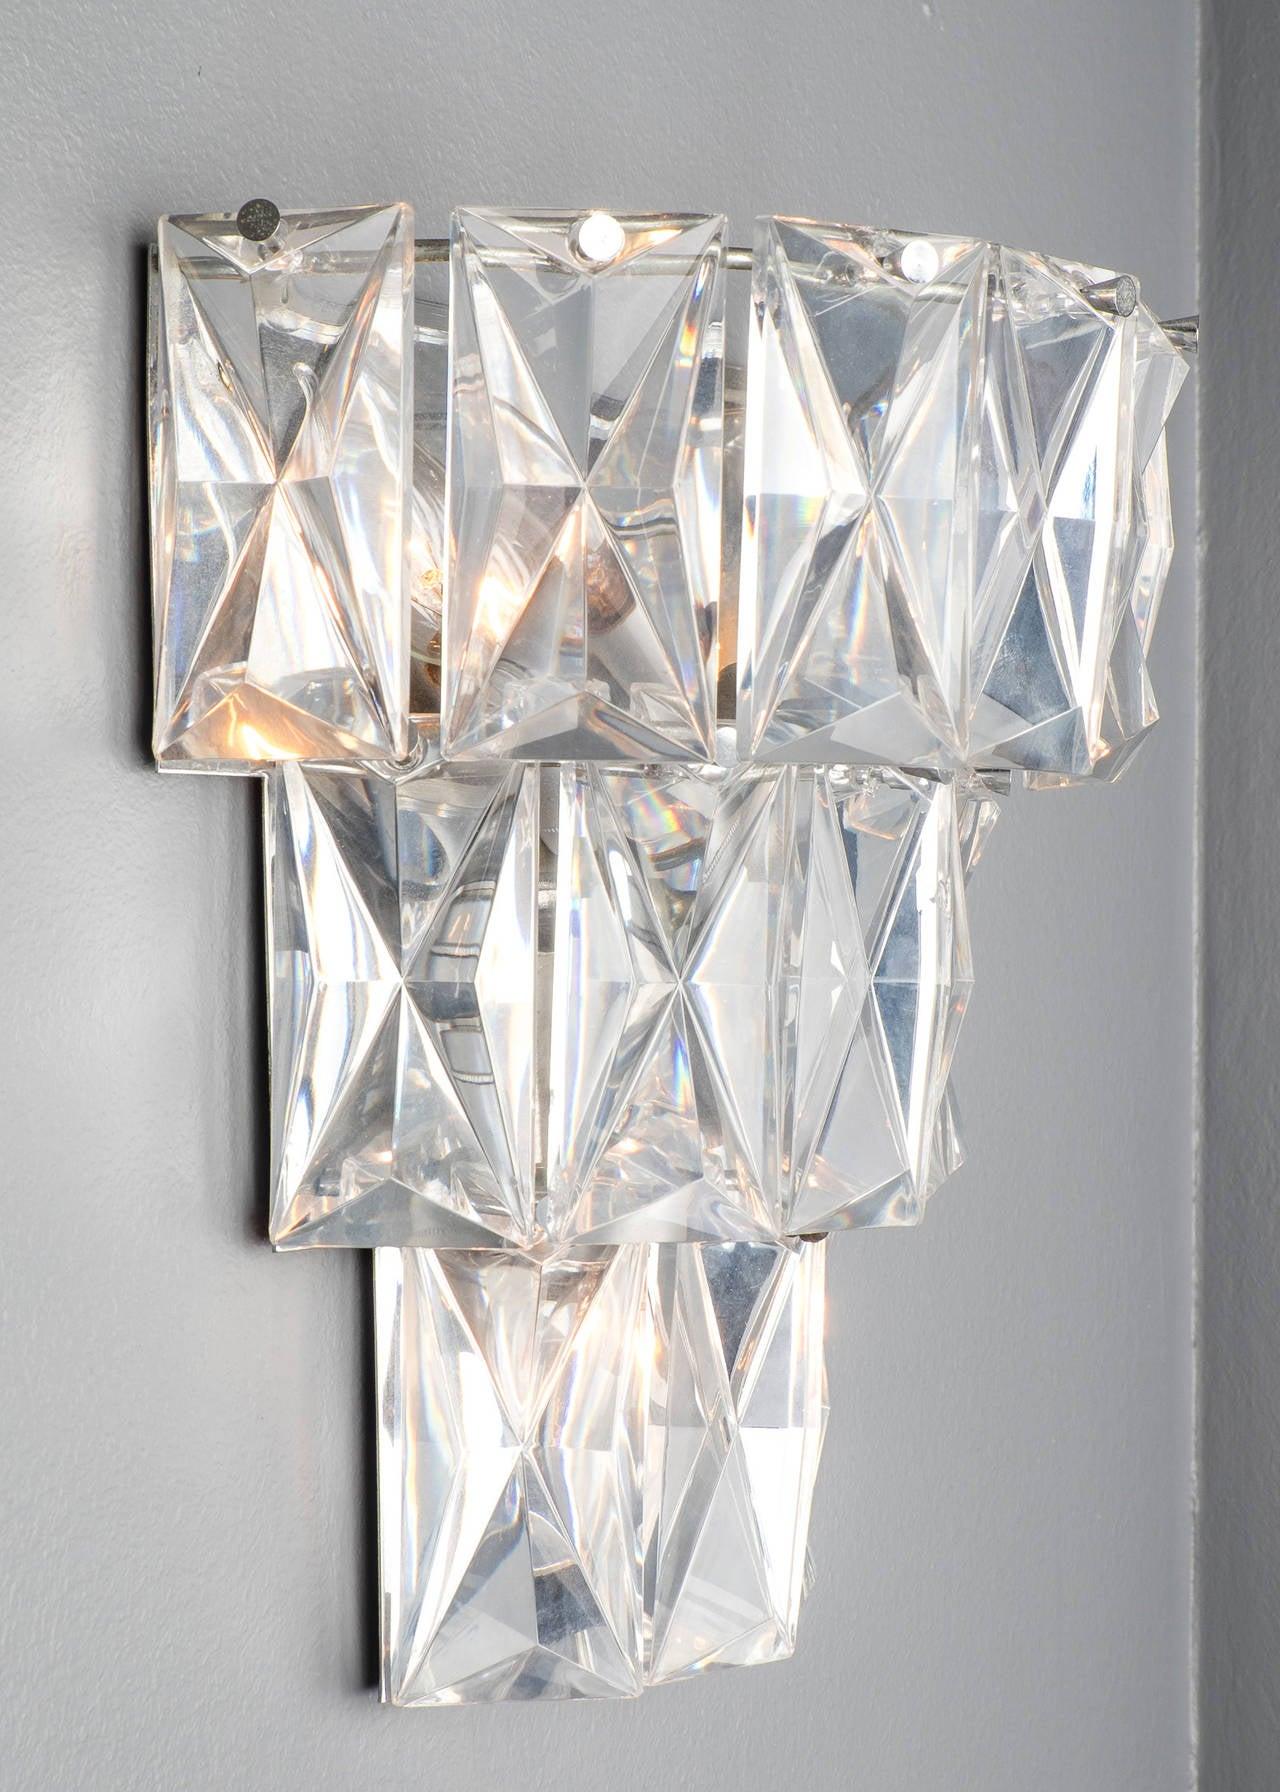 Baccarat Crystal Wall Sconce at 1stdibs